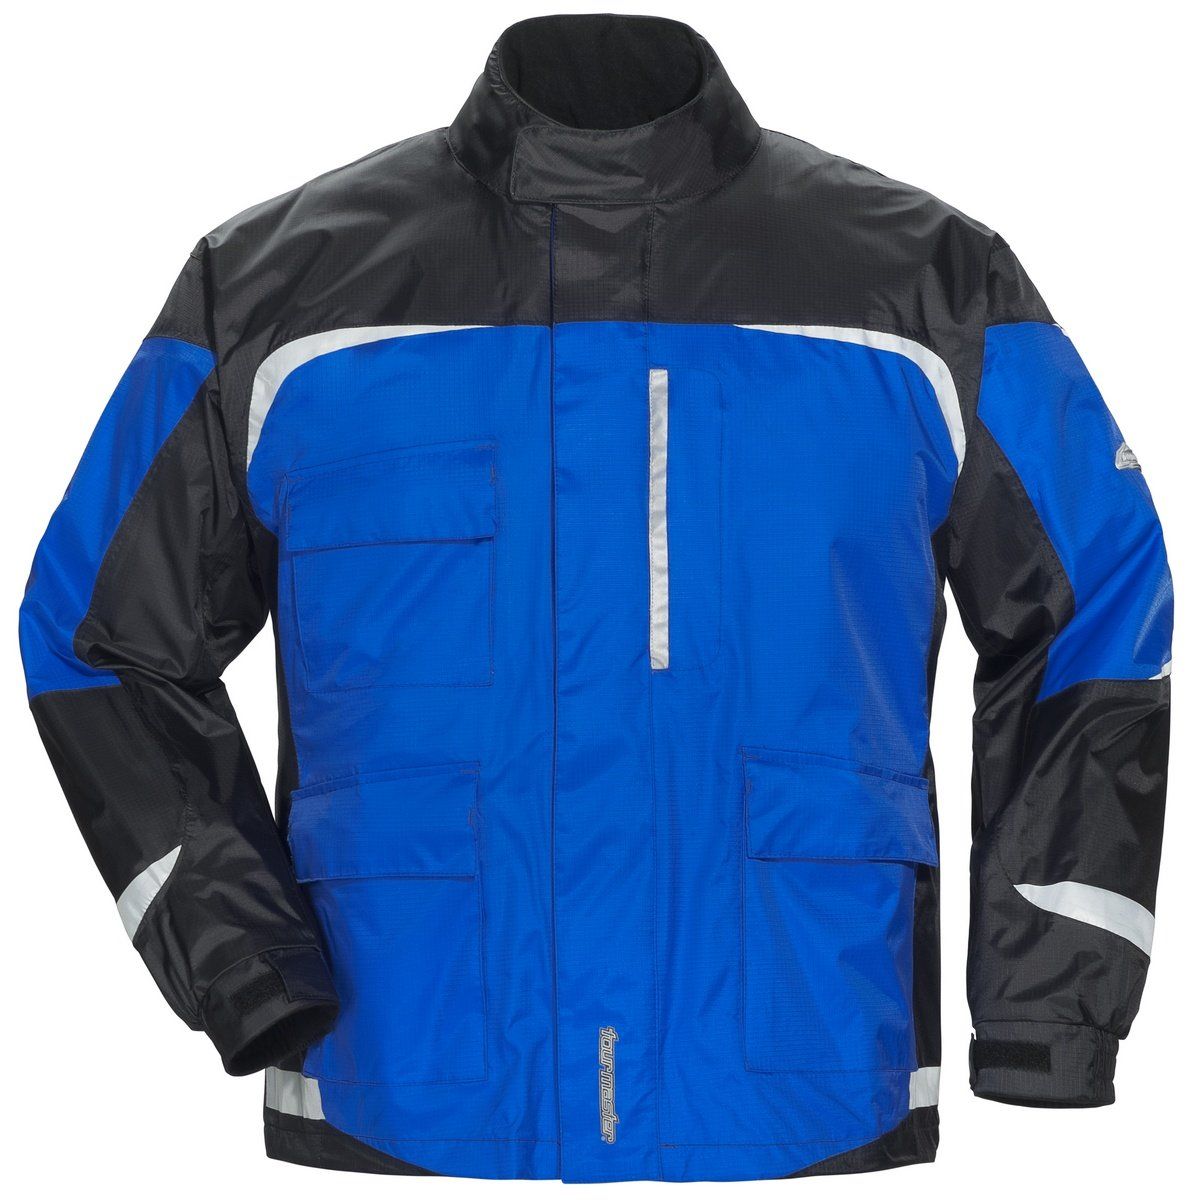 Tourmaster Sentinel 2.0 Rain Jacket (X-LARGE) (HI-VIZ YELLOW/BLACK) 8795-0213-07